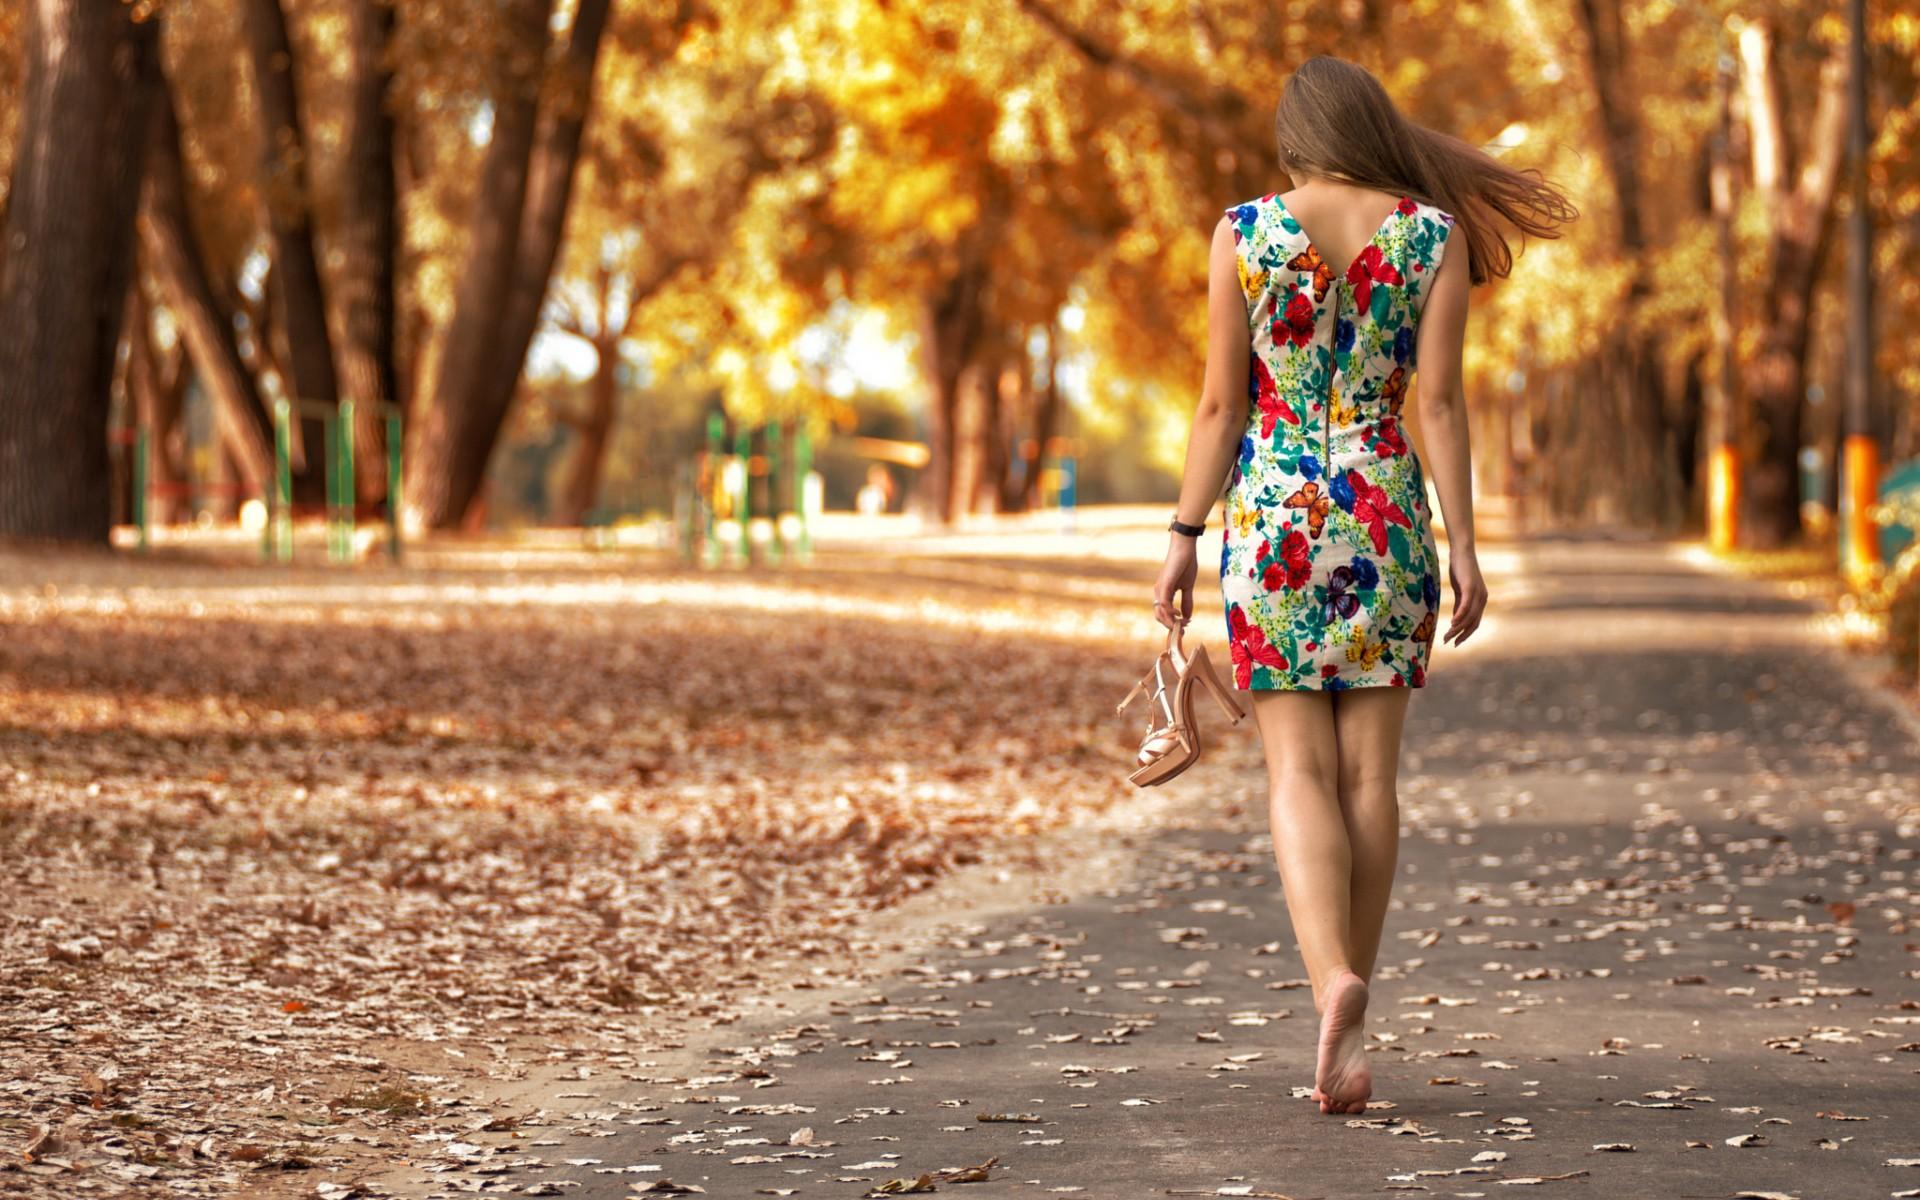 https://get.wallhere.com/photo/fall-women-outdoors-women-model-barefoot-park-outdoors-photography-dress-fashion-spring-color-autumn-child-girl-beauty-season-photograph-photo-shoot-6537.jpg